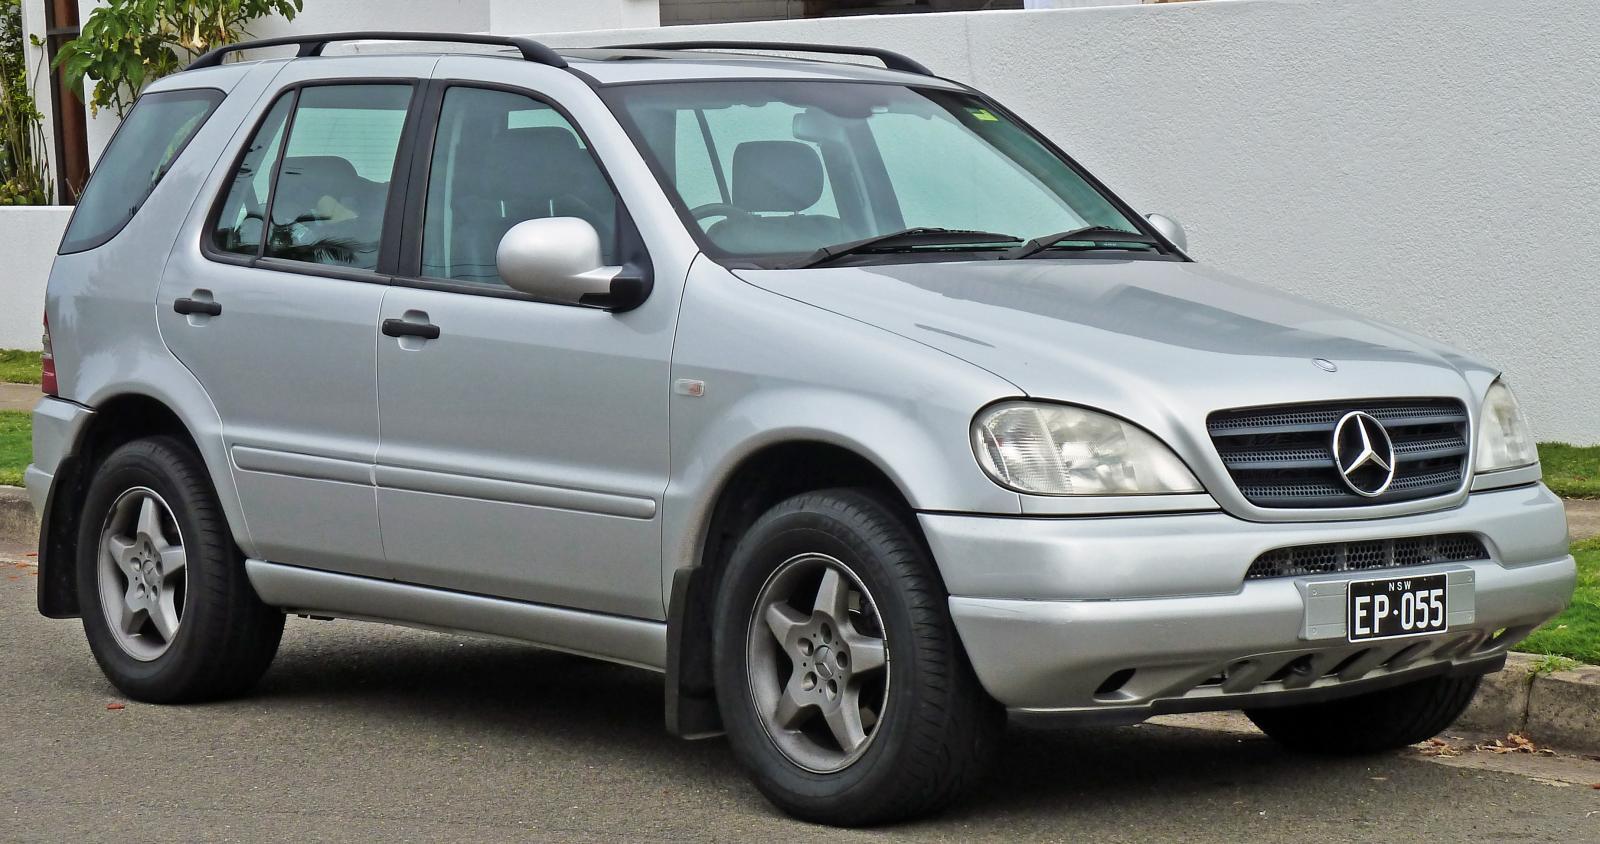 800 1024 1280 1600 origin 1998 Mercedes-Benz ...